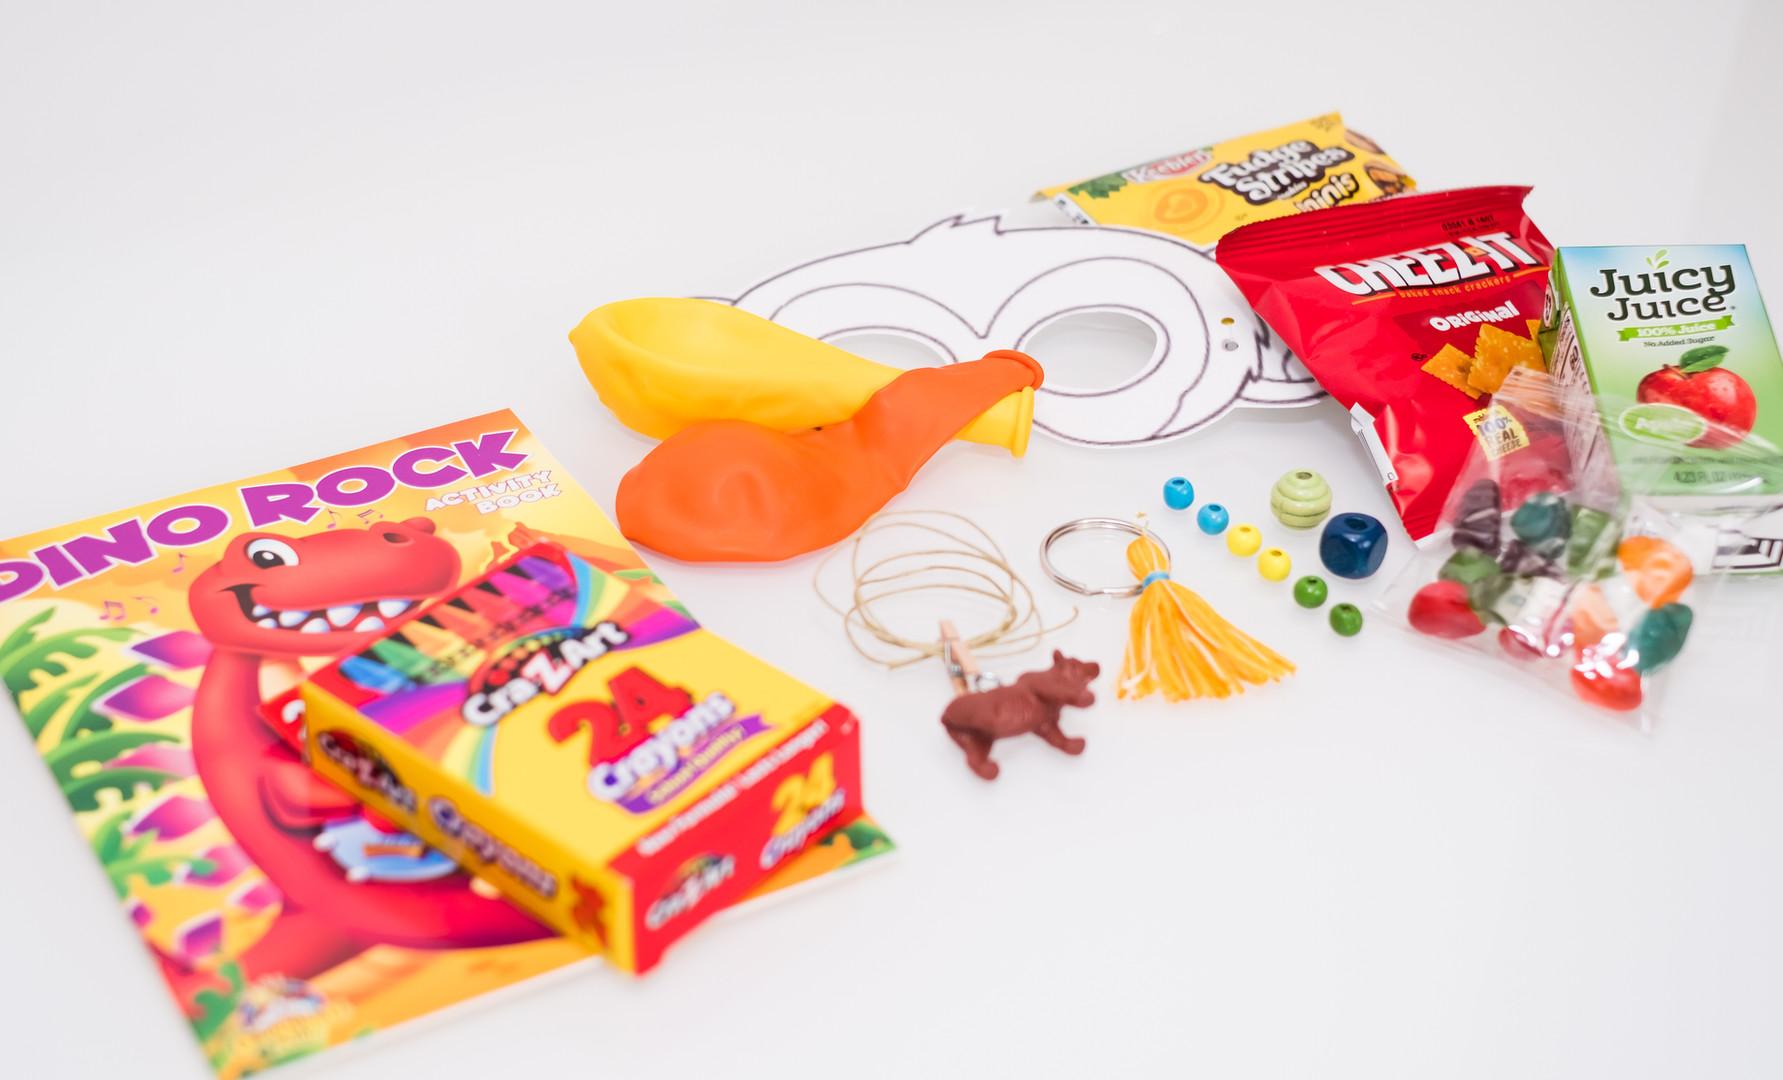 Copy of Birthday Kit Box-12.jpg